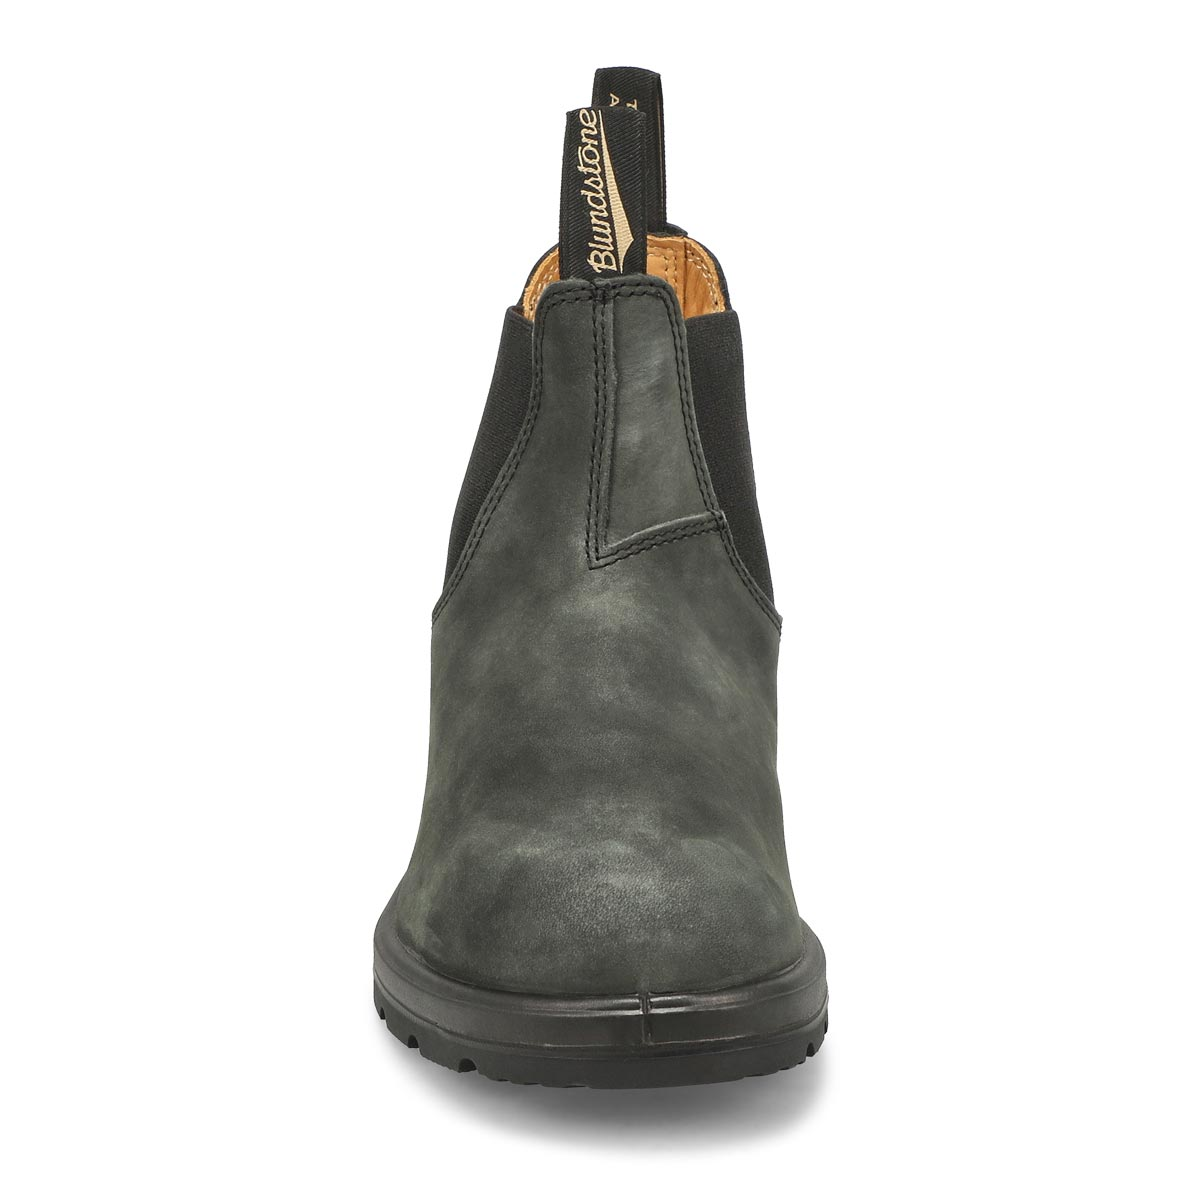 Unisex 550 SERIES rustic black boots - UK SIZING